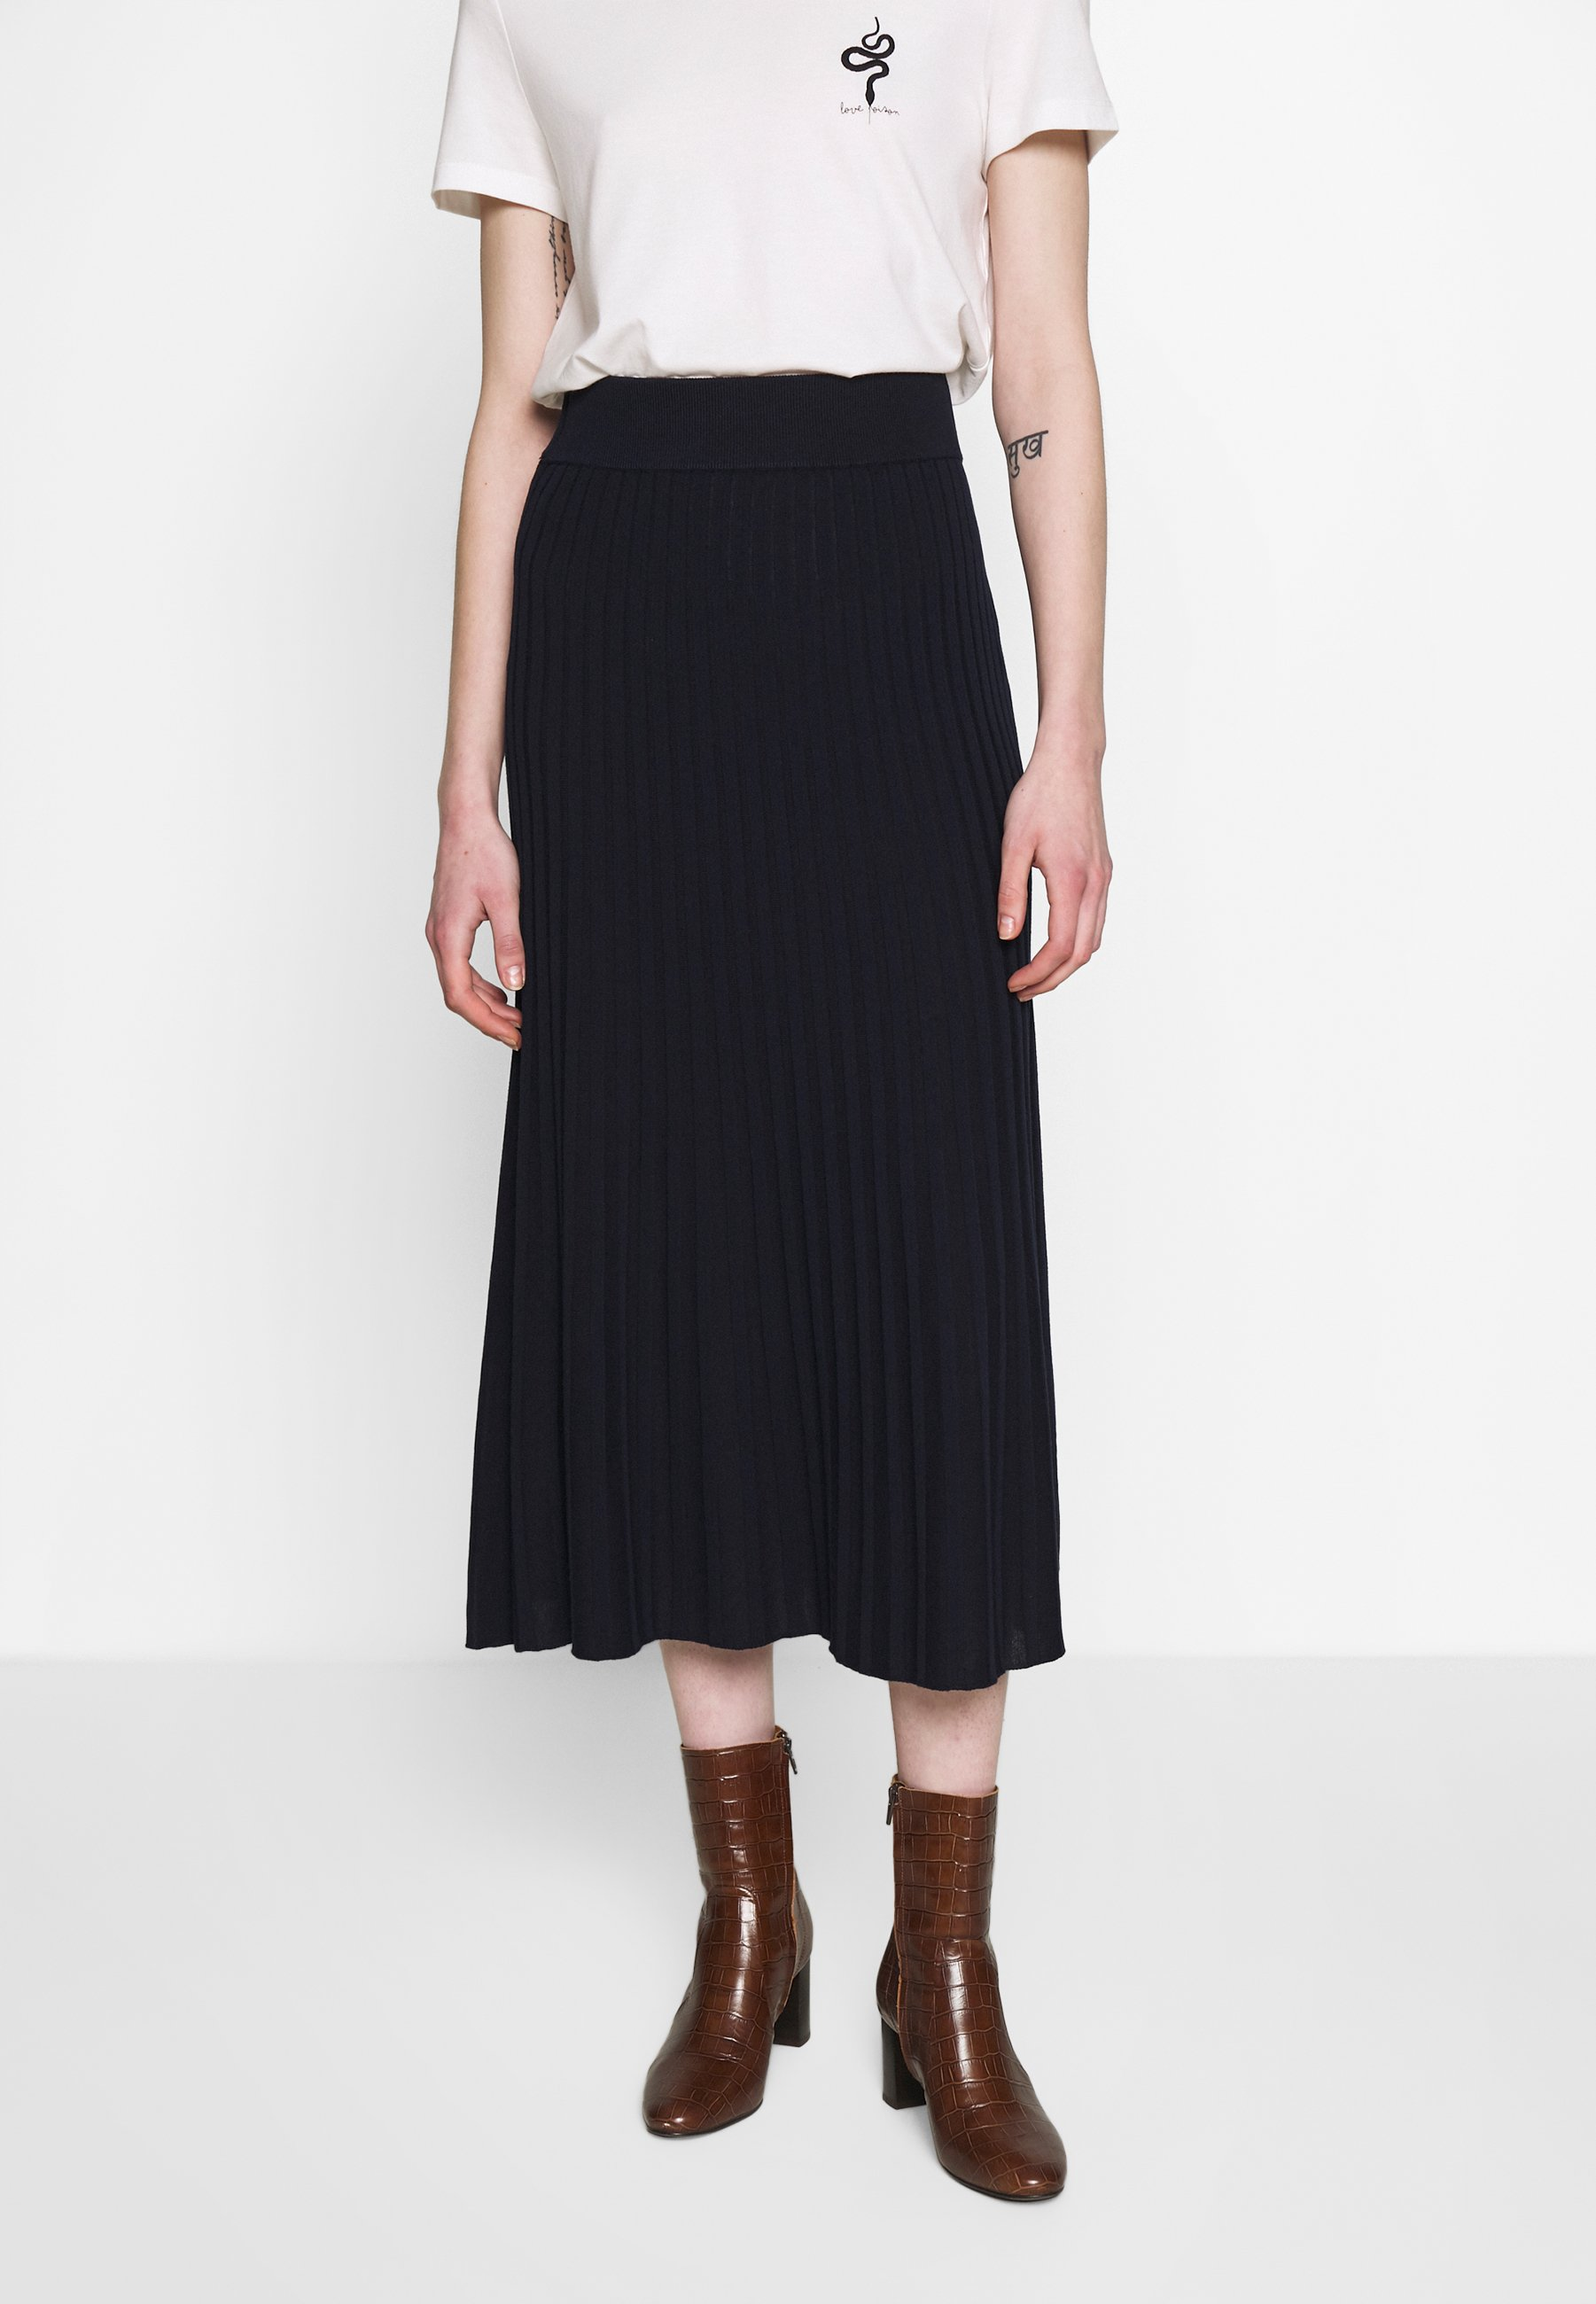 Yas Yasfeline Midi Skirt - A-lijn Rok Dark Sapphire TpAuq1mq